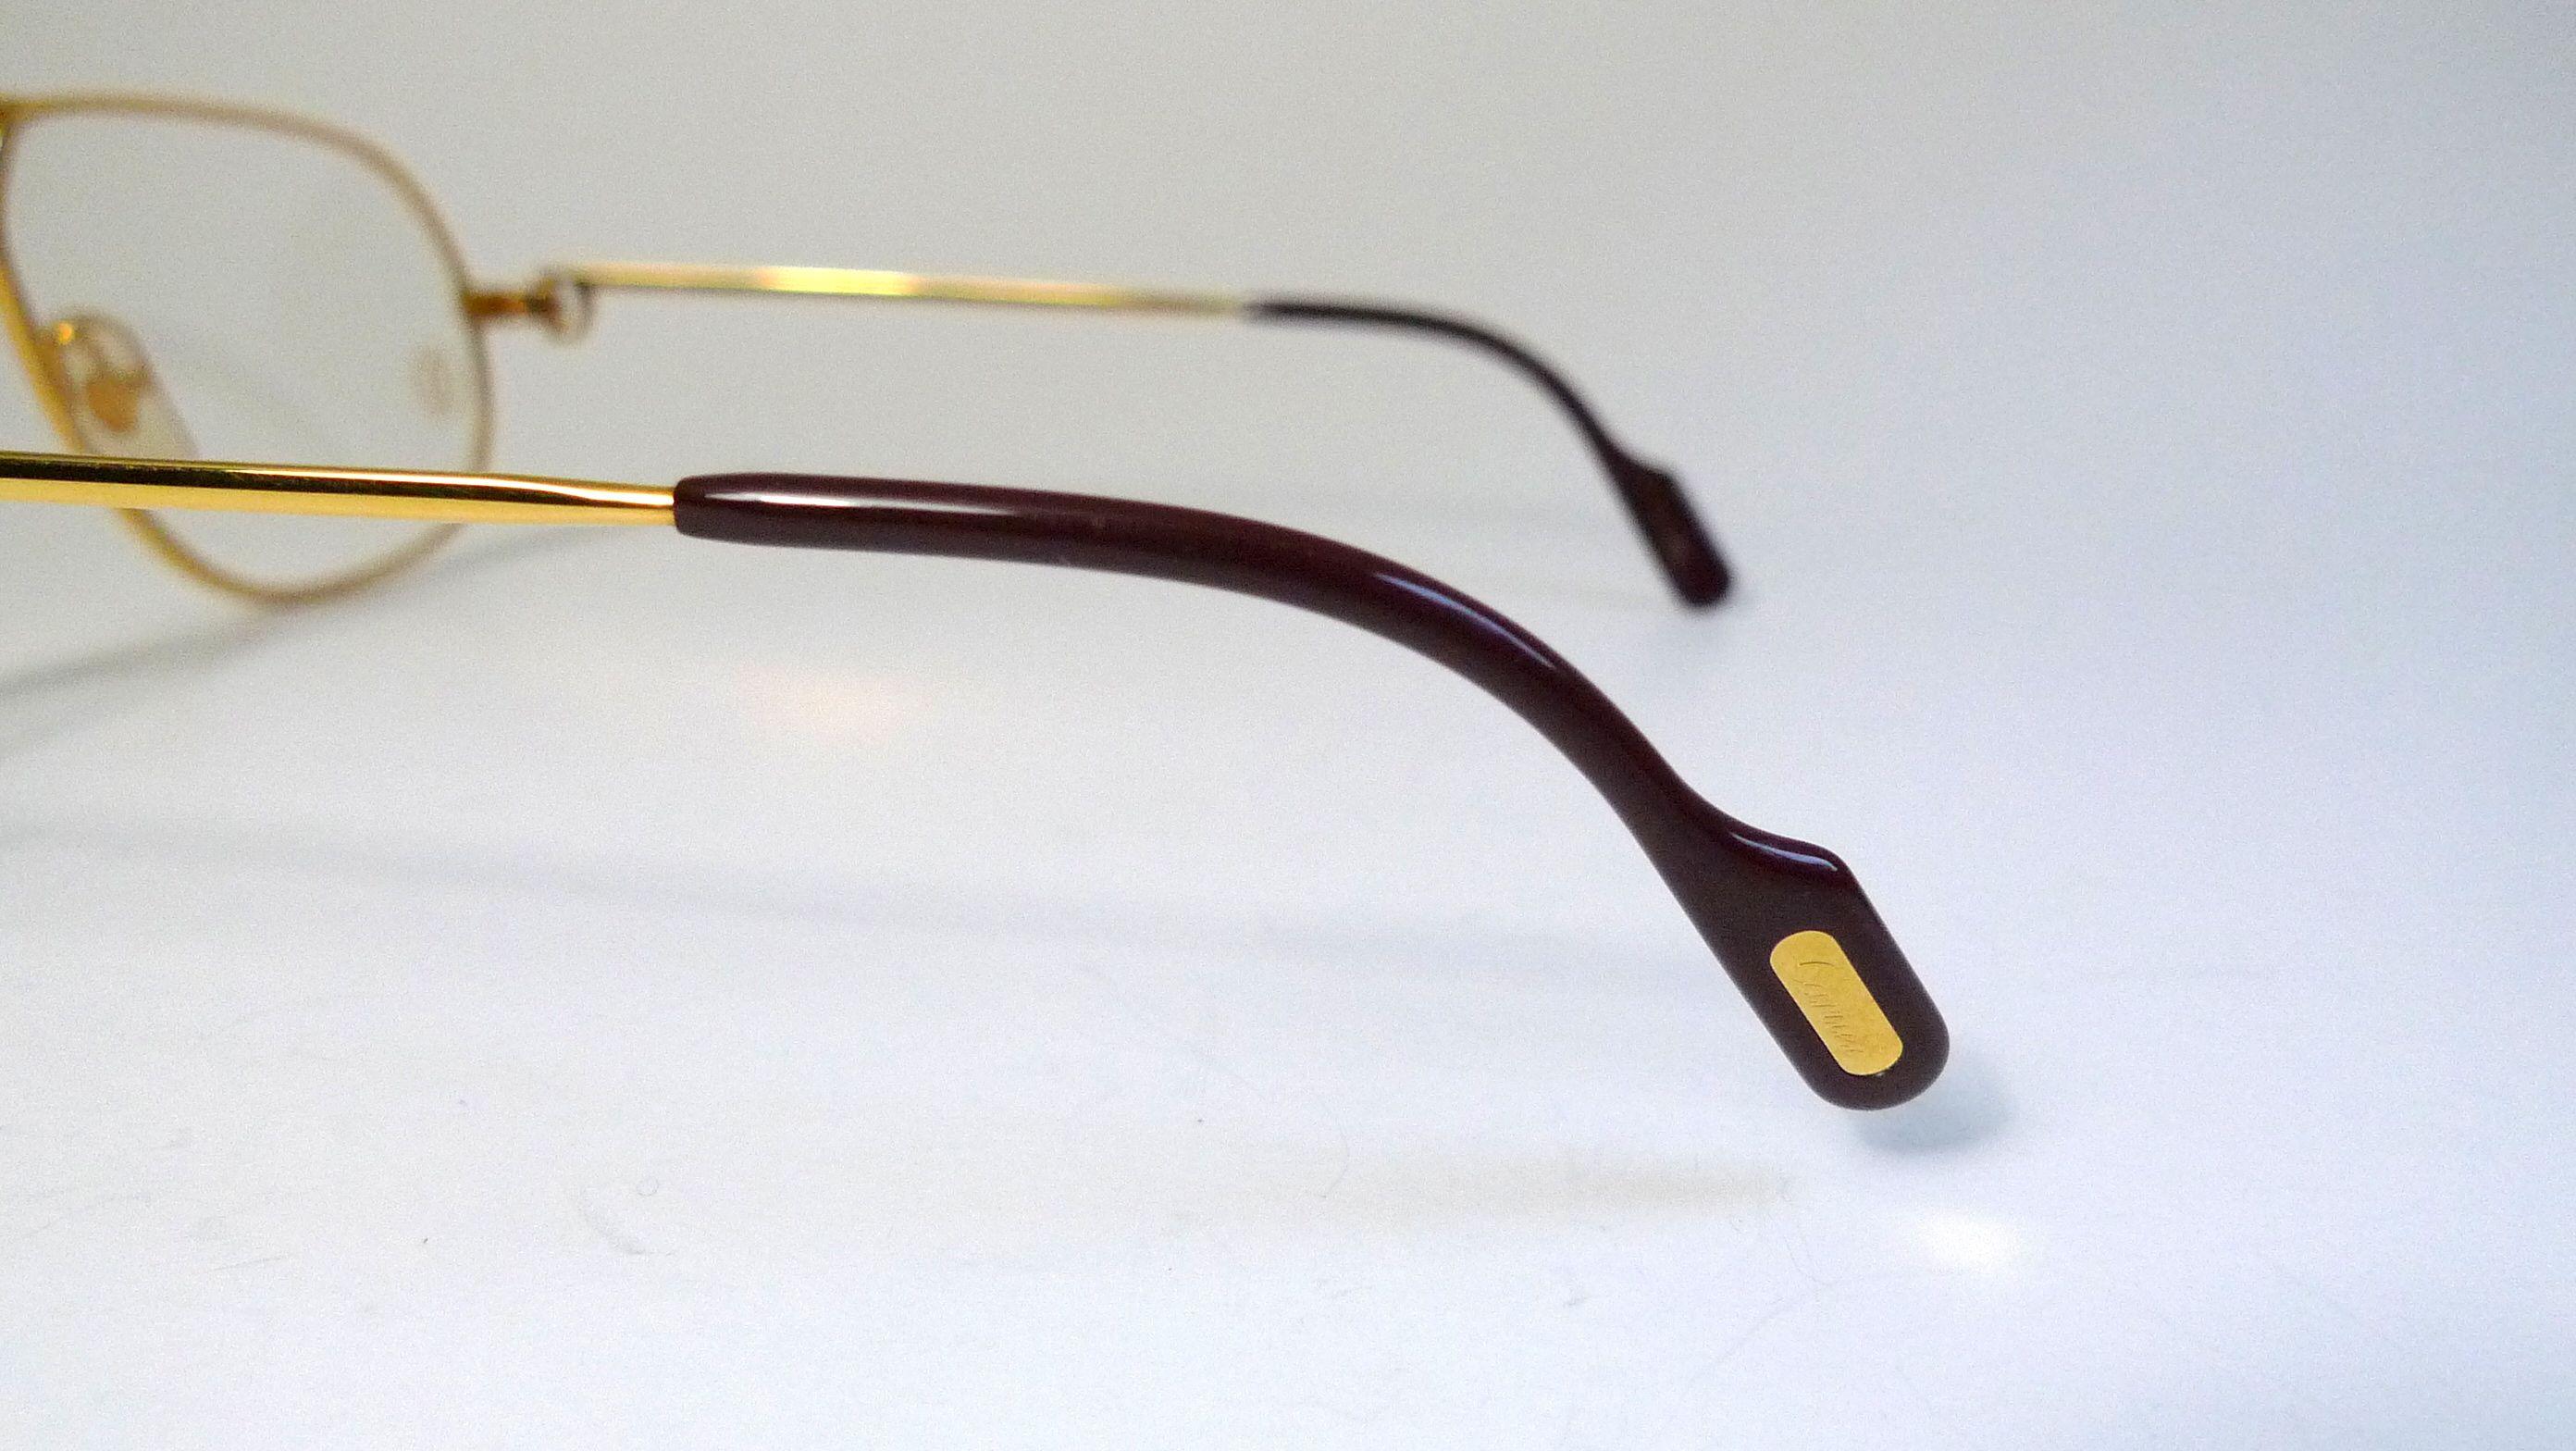 7f4a58fcbab9 CARTIER TANK LOUIS CARTIER – Vintage for me   lunettes okulary sonnenbrille  眼镜 sunglasses frame 眼鏡 occhiali solaires نظارات óculos de sol gafas   all  ...